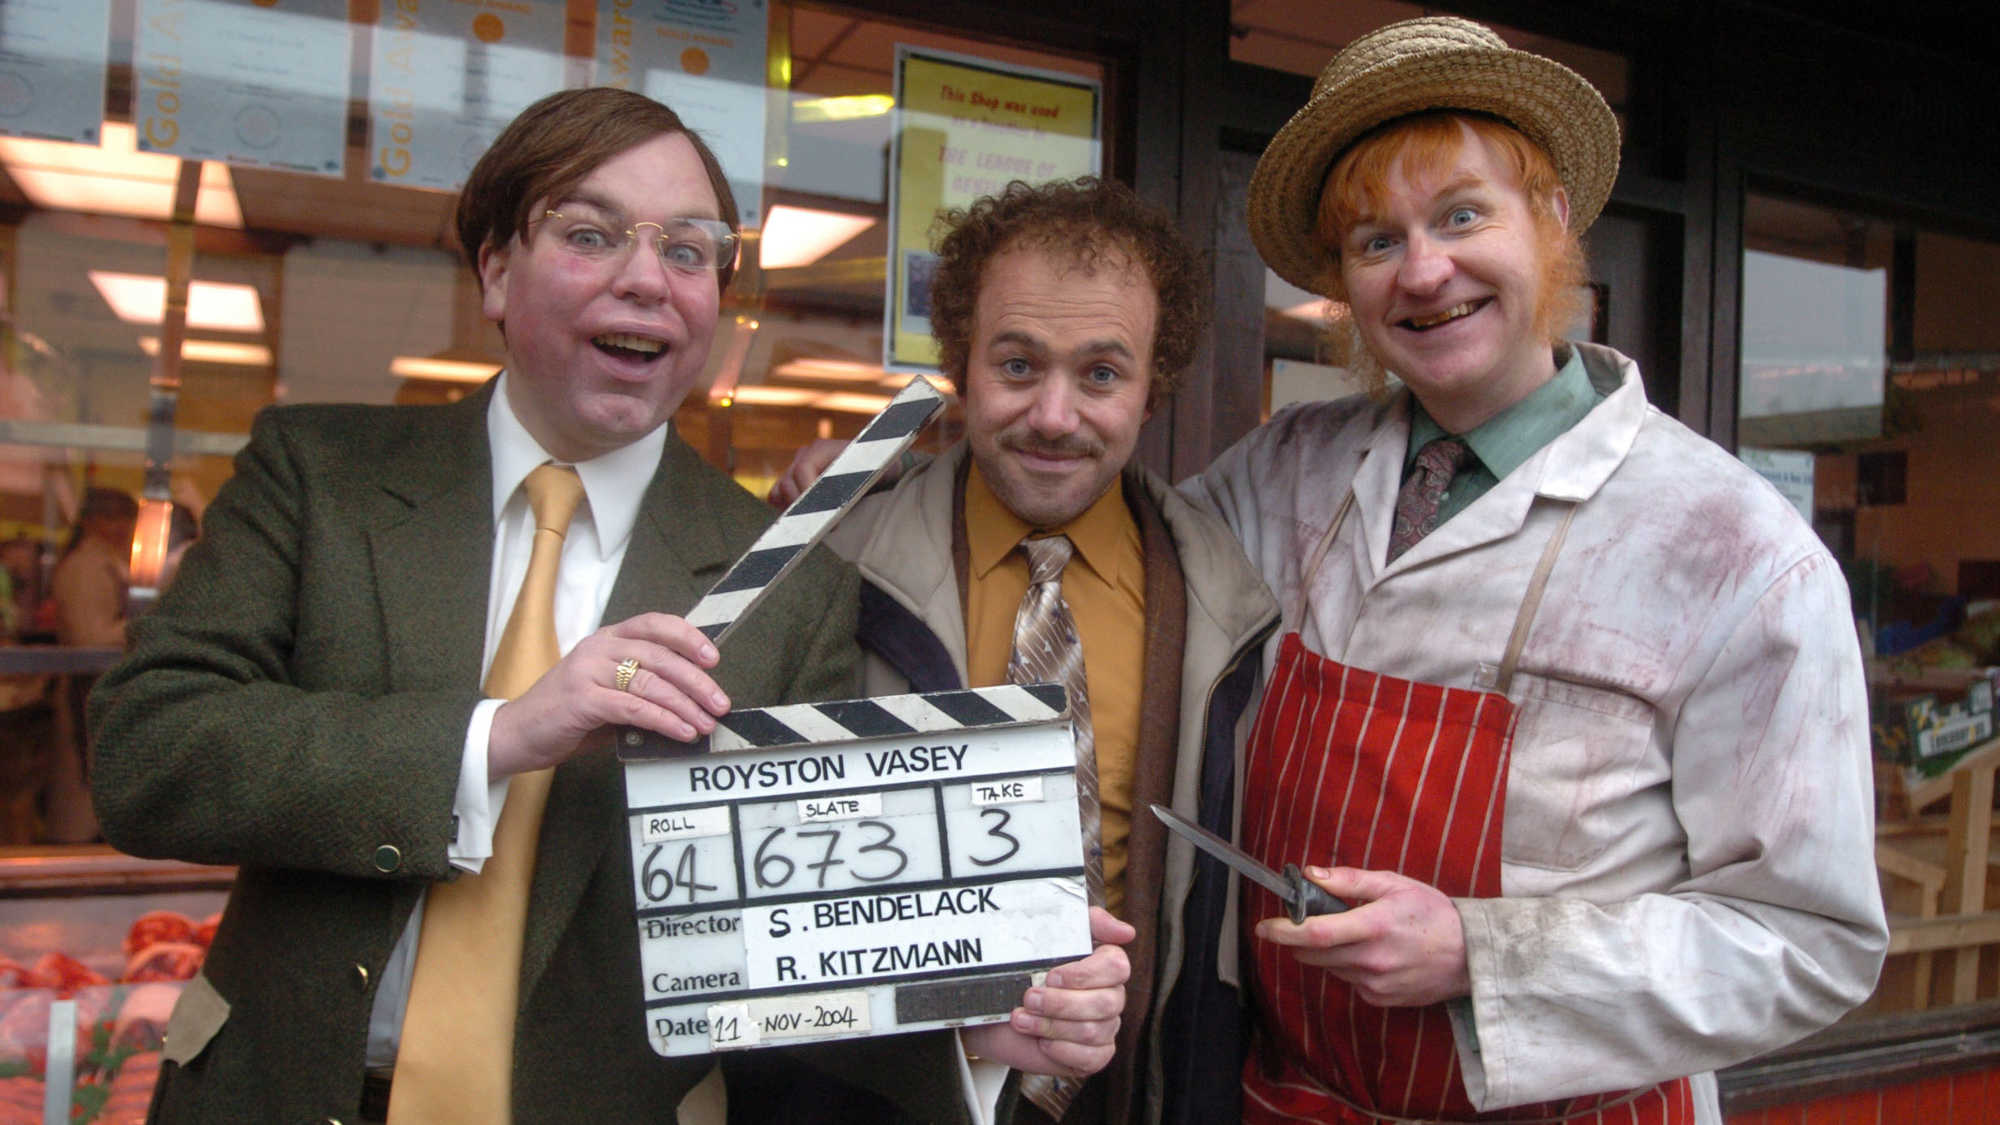 The League of Gentlemen on set - Steve Pemberton, Reece Shearsmith and Mark Gatiss in The League of Gentlemen's Apocalypse (2005)